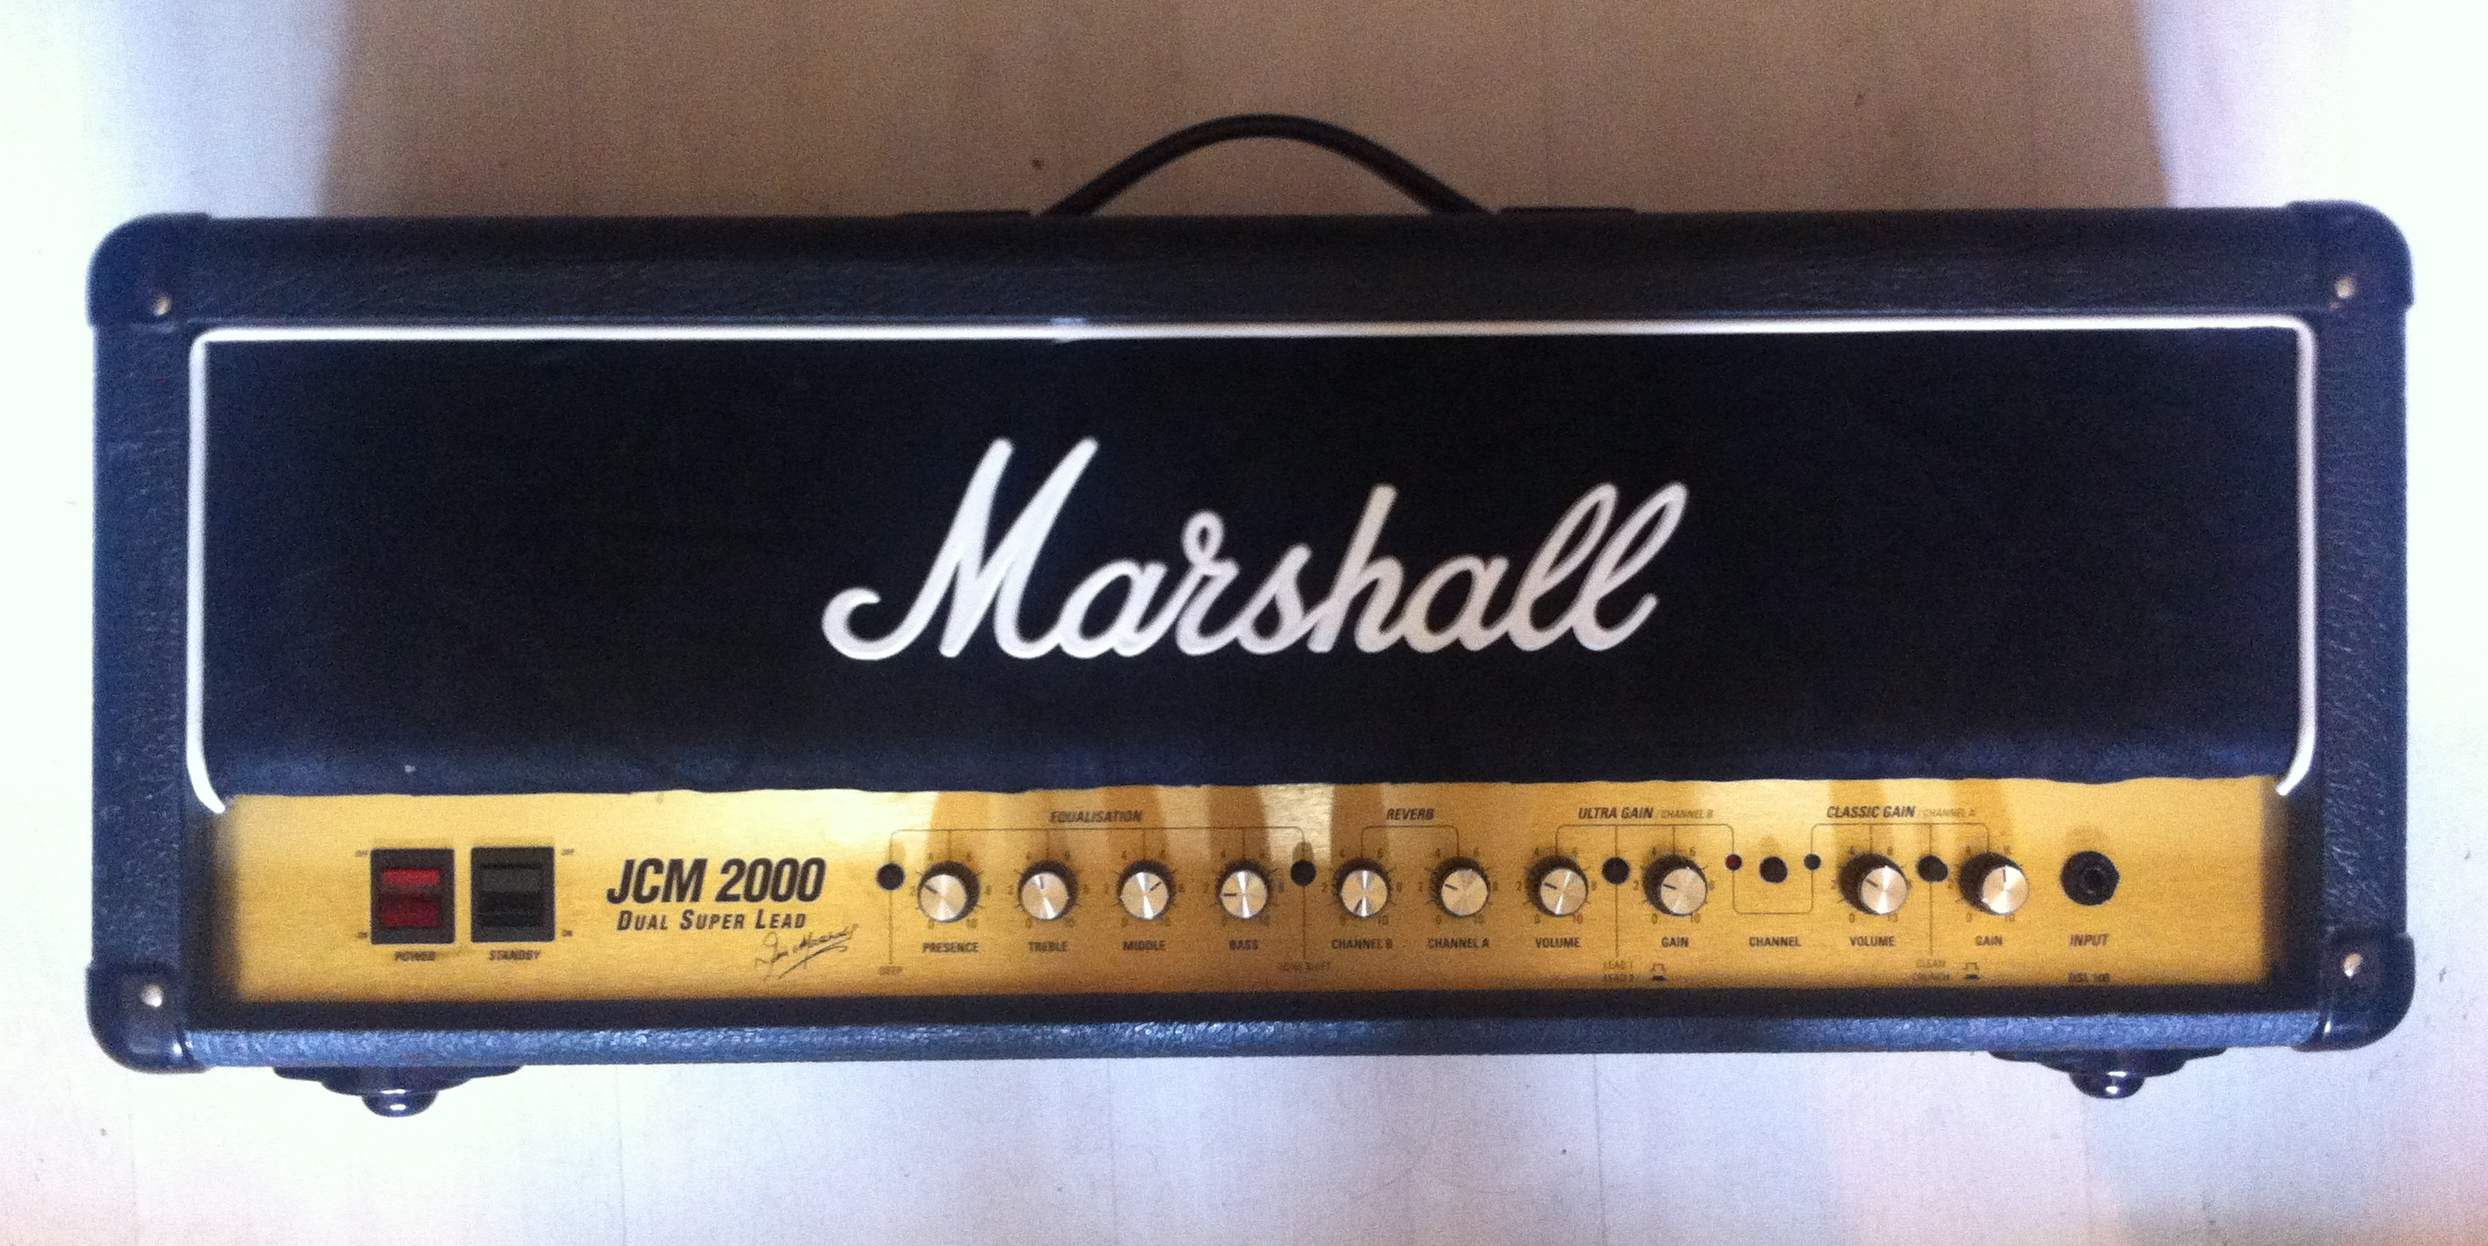 vends marshall jcm2000 dsl100 tete guitare 100w ampli. Black Bedroom Furniture Sets. Home Design Ideas